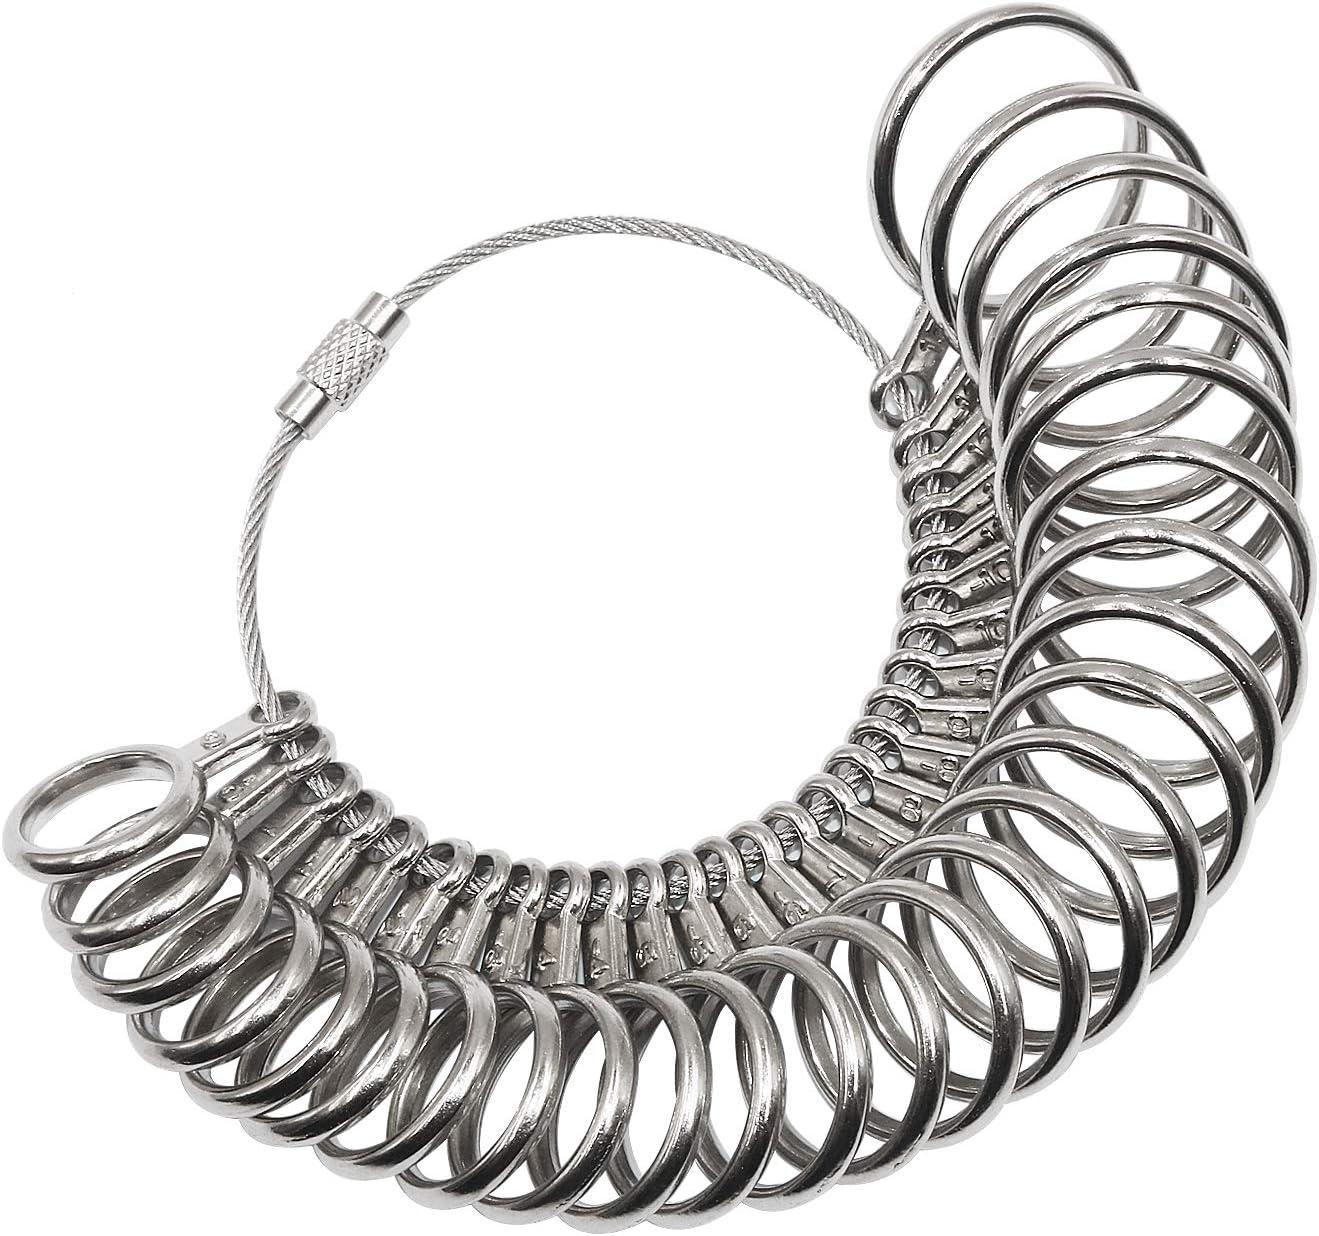 XINYUNG 26 Pcs Metal Ring Sizer UK A-Z Standard Finger Sizing Tool for Women and Men Finger Gauges Measuring Ring Tool